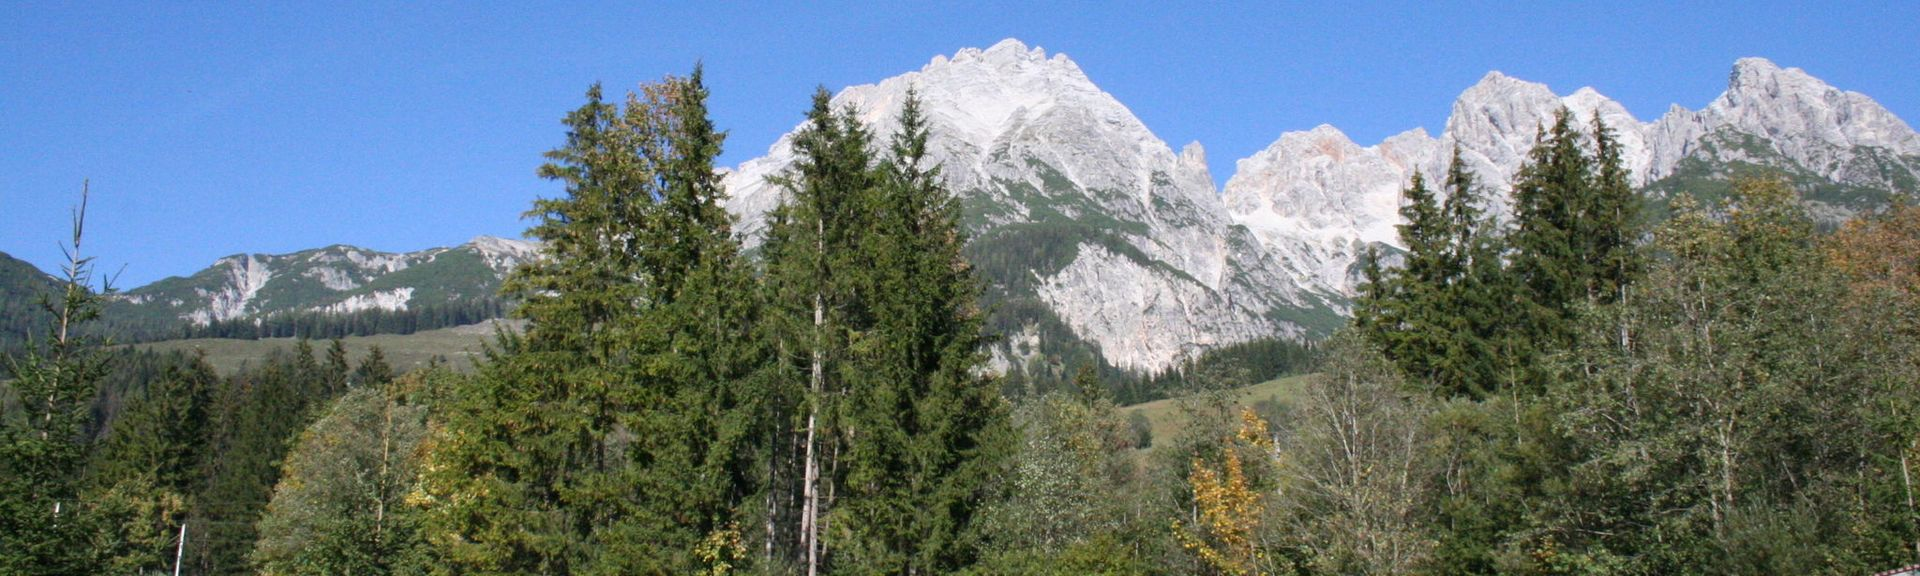 Kitzsteinhorn Alpine Center, Zell am See, Austria